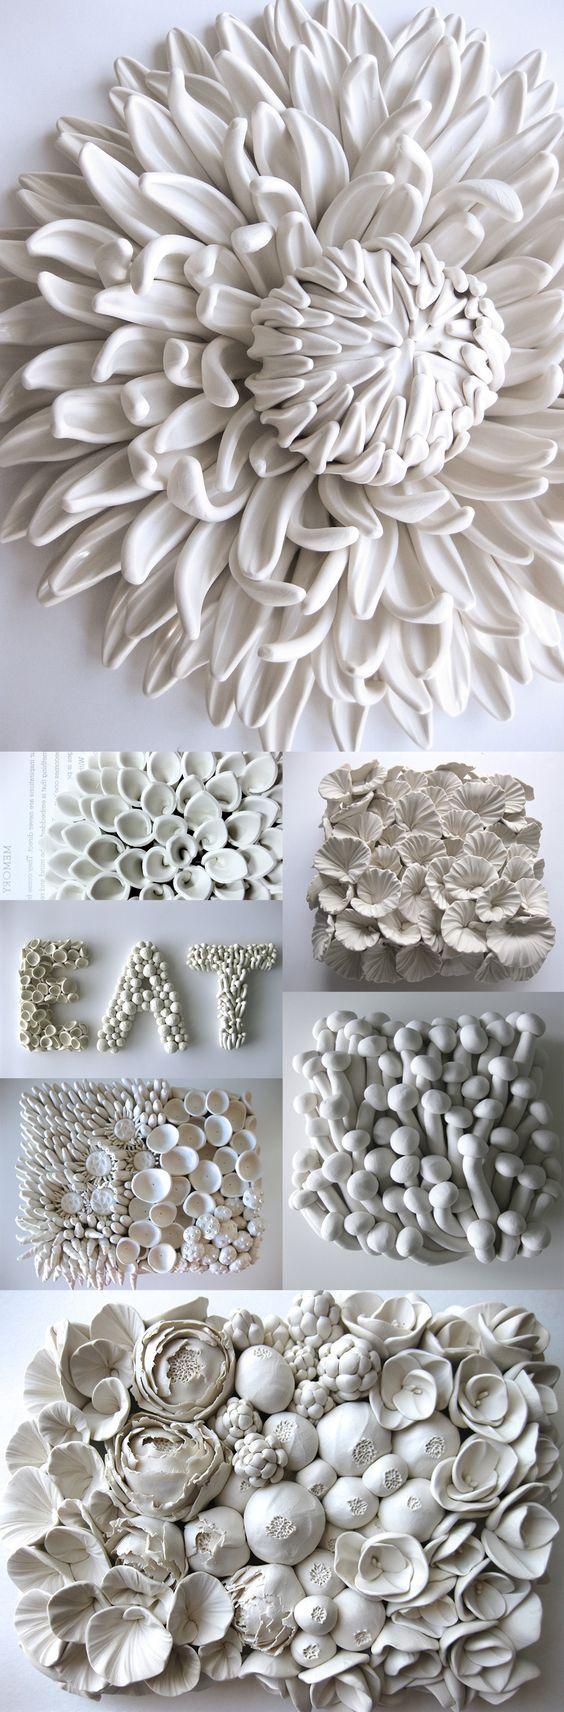 Ceramic Flower Sculptures and Tiles by Angela Schwer